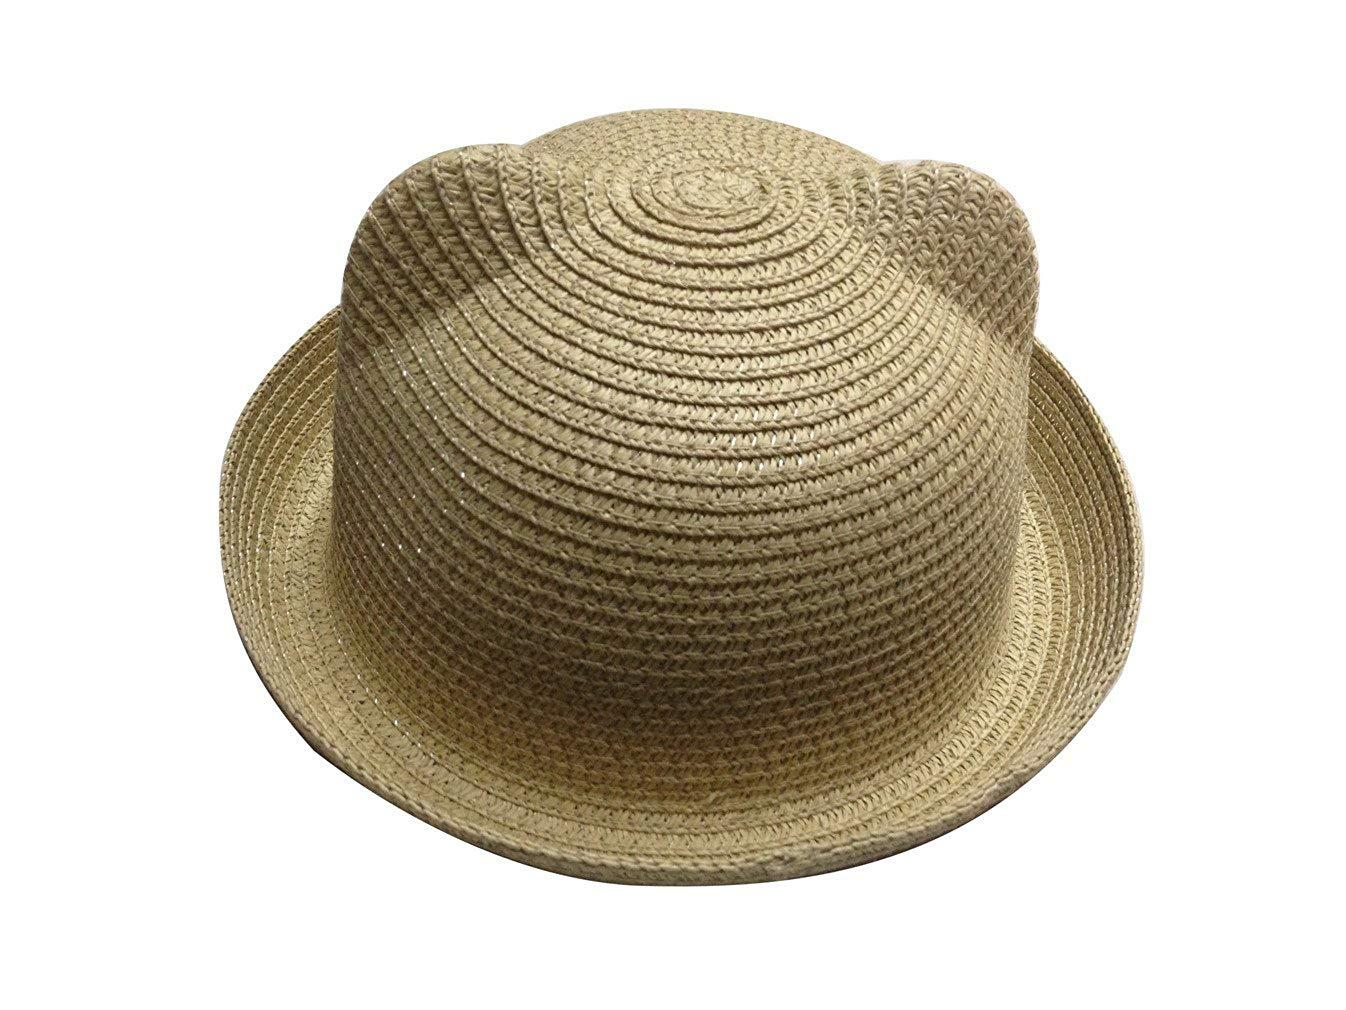 10e6a8b3bbce Hats & Caps Jtc Wool Floppy Wide Brim Hat Fedora Bowler Bowknot Band Cap